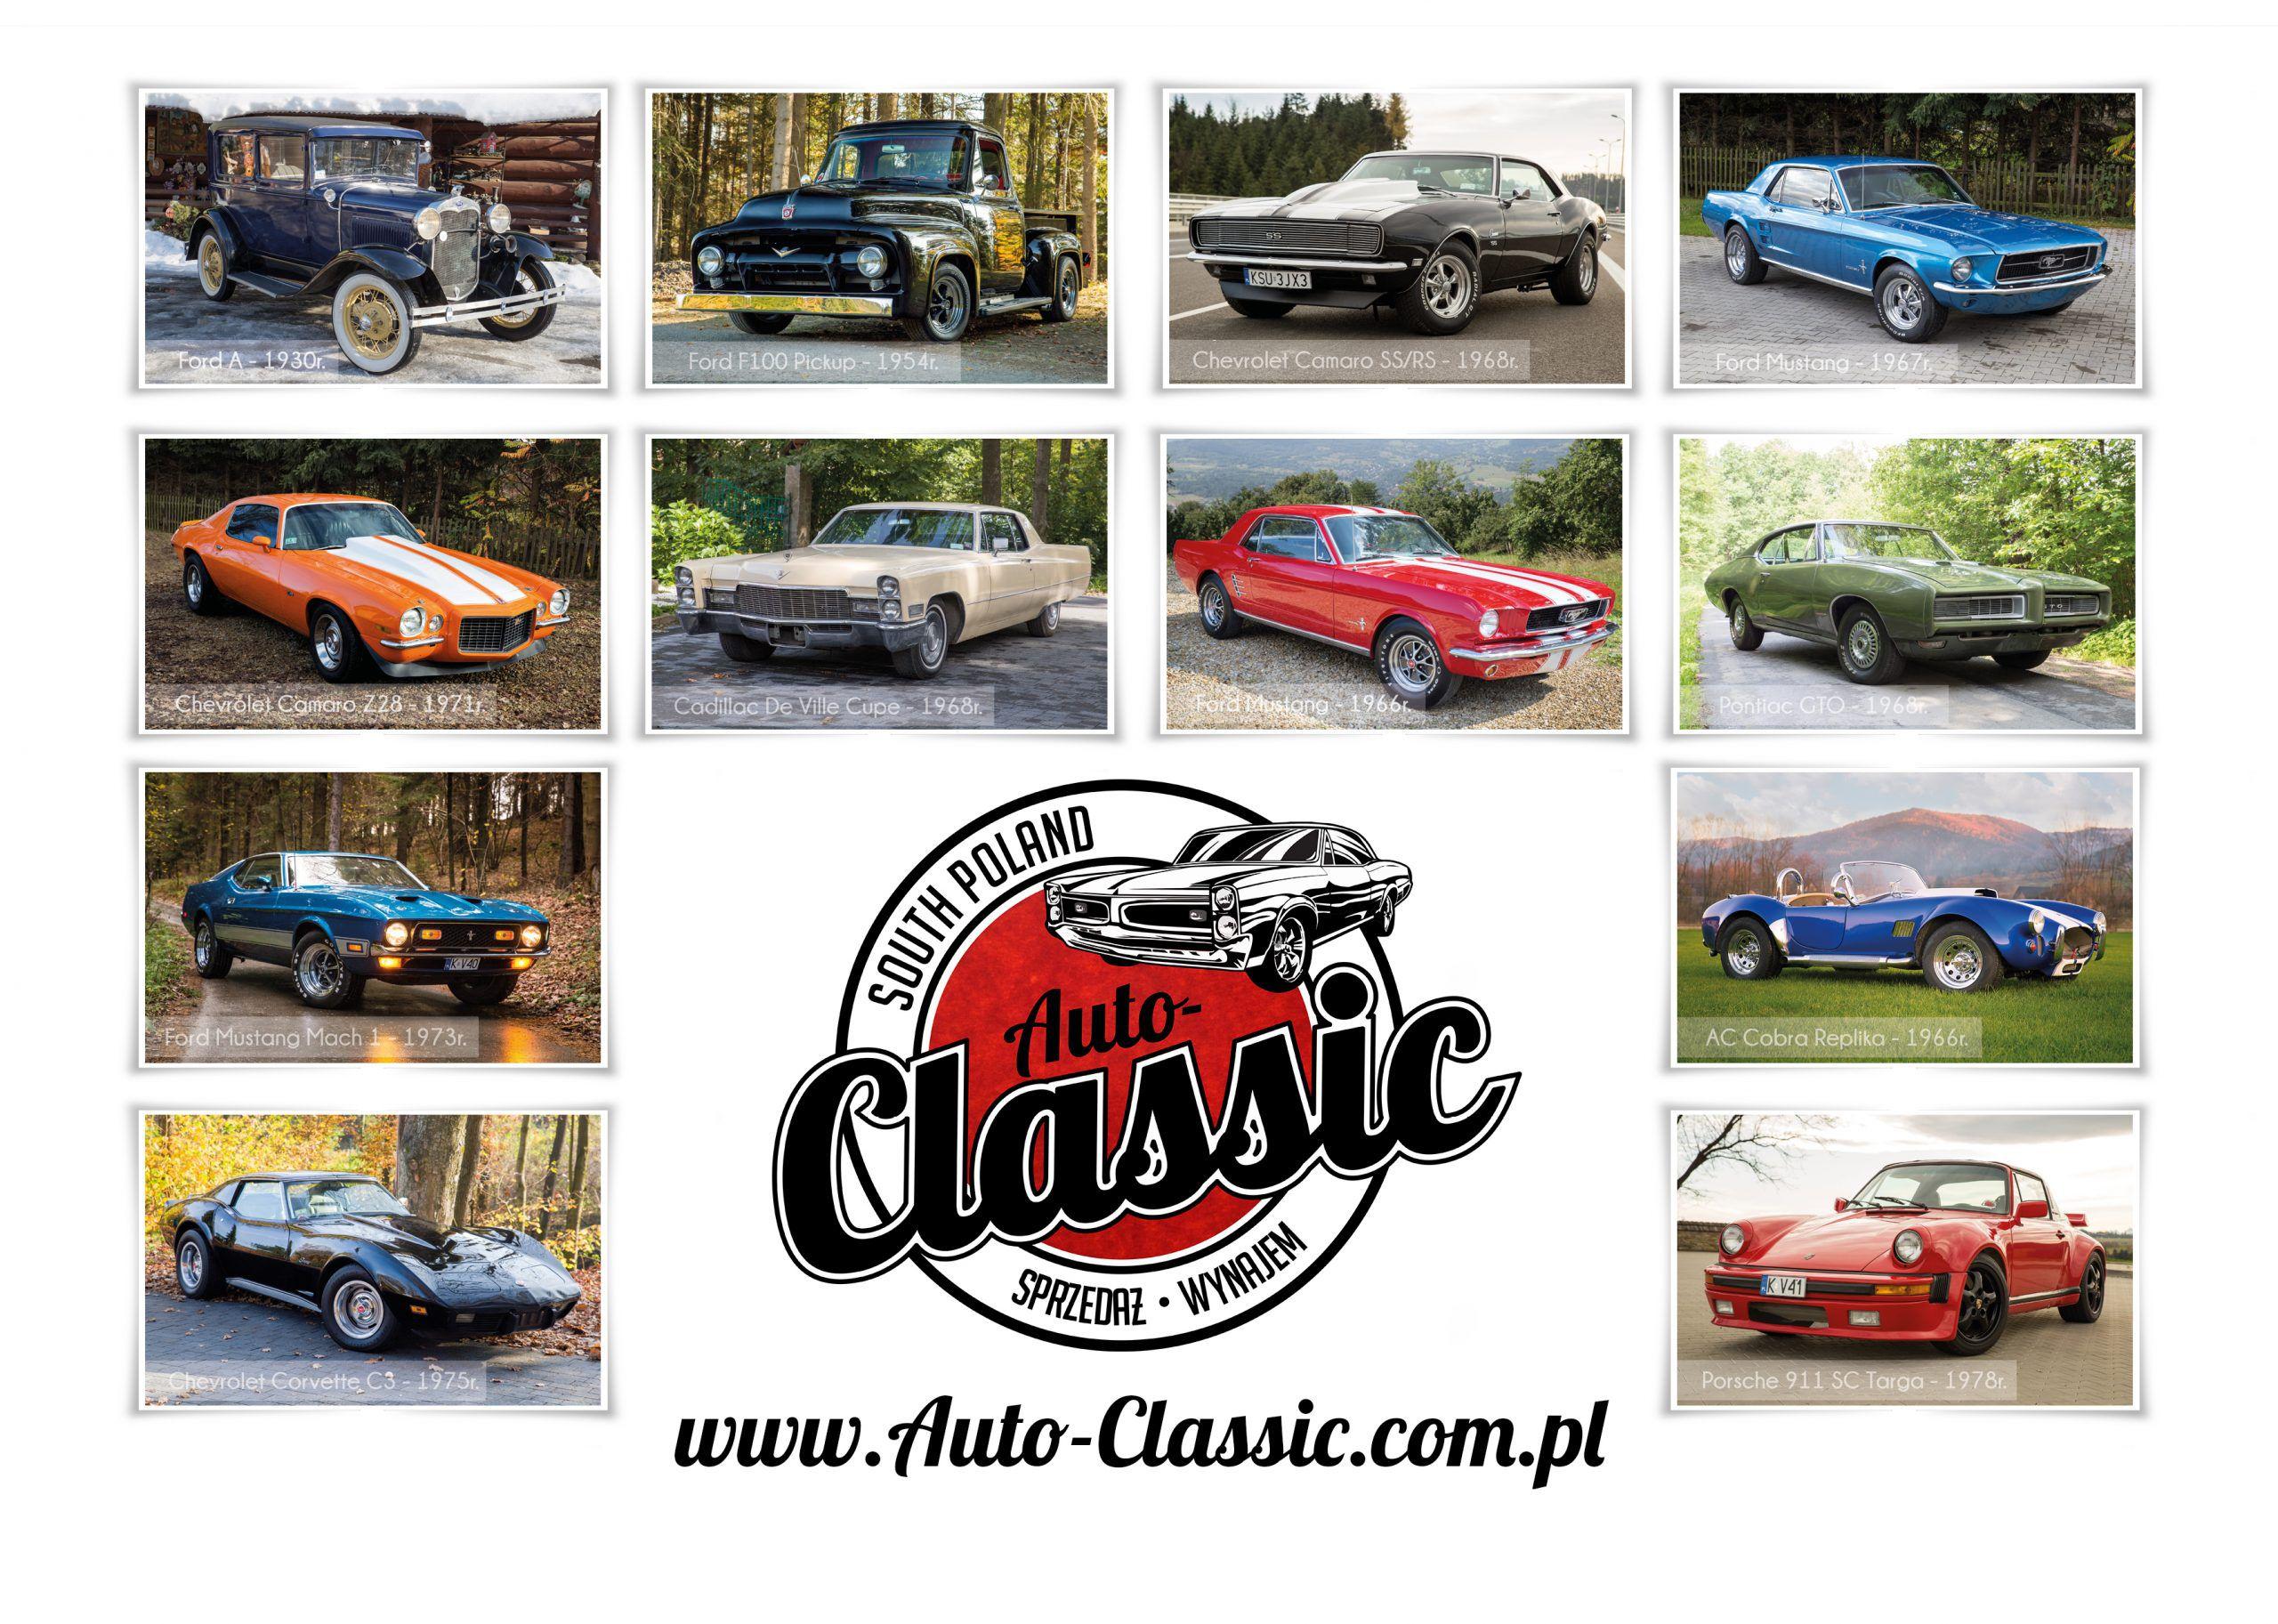 Kalendarz 2020 Auto-Classic